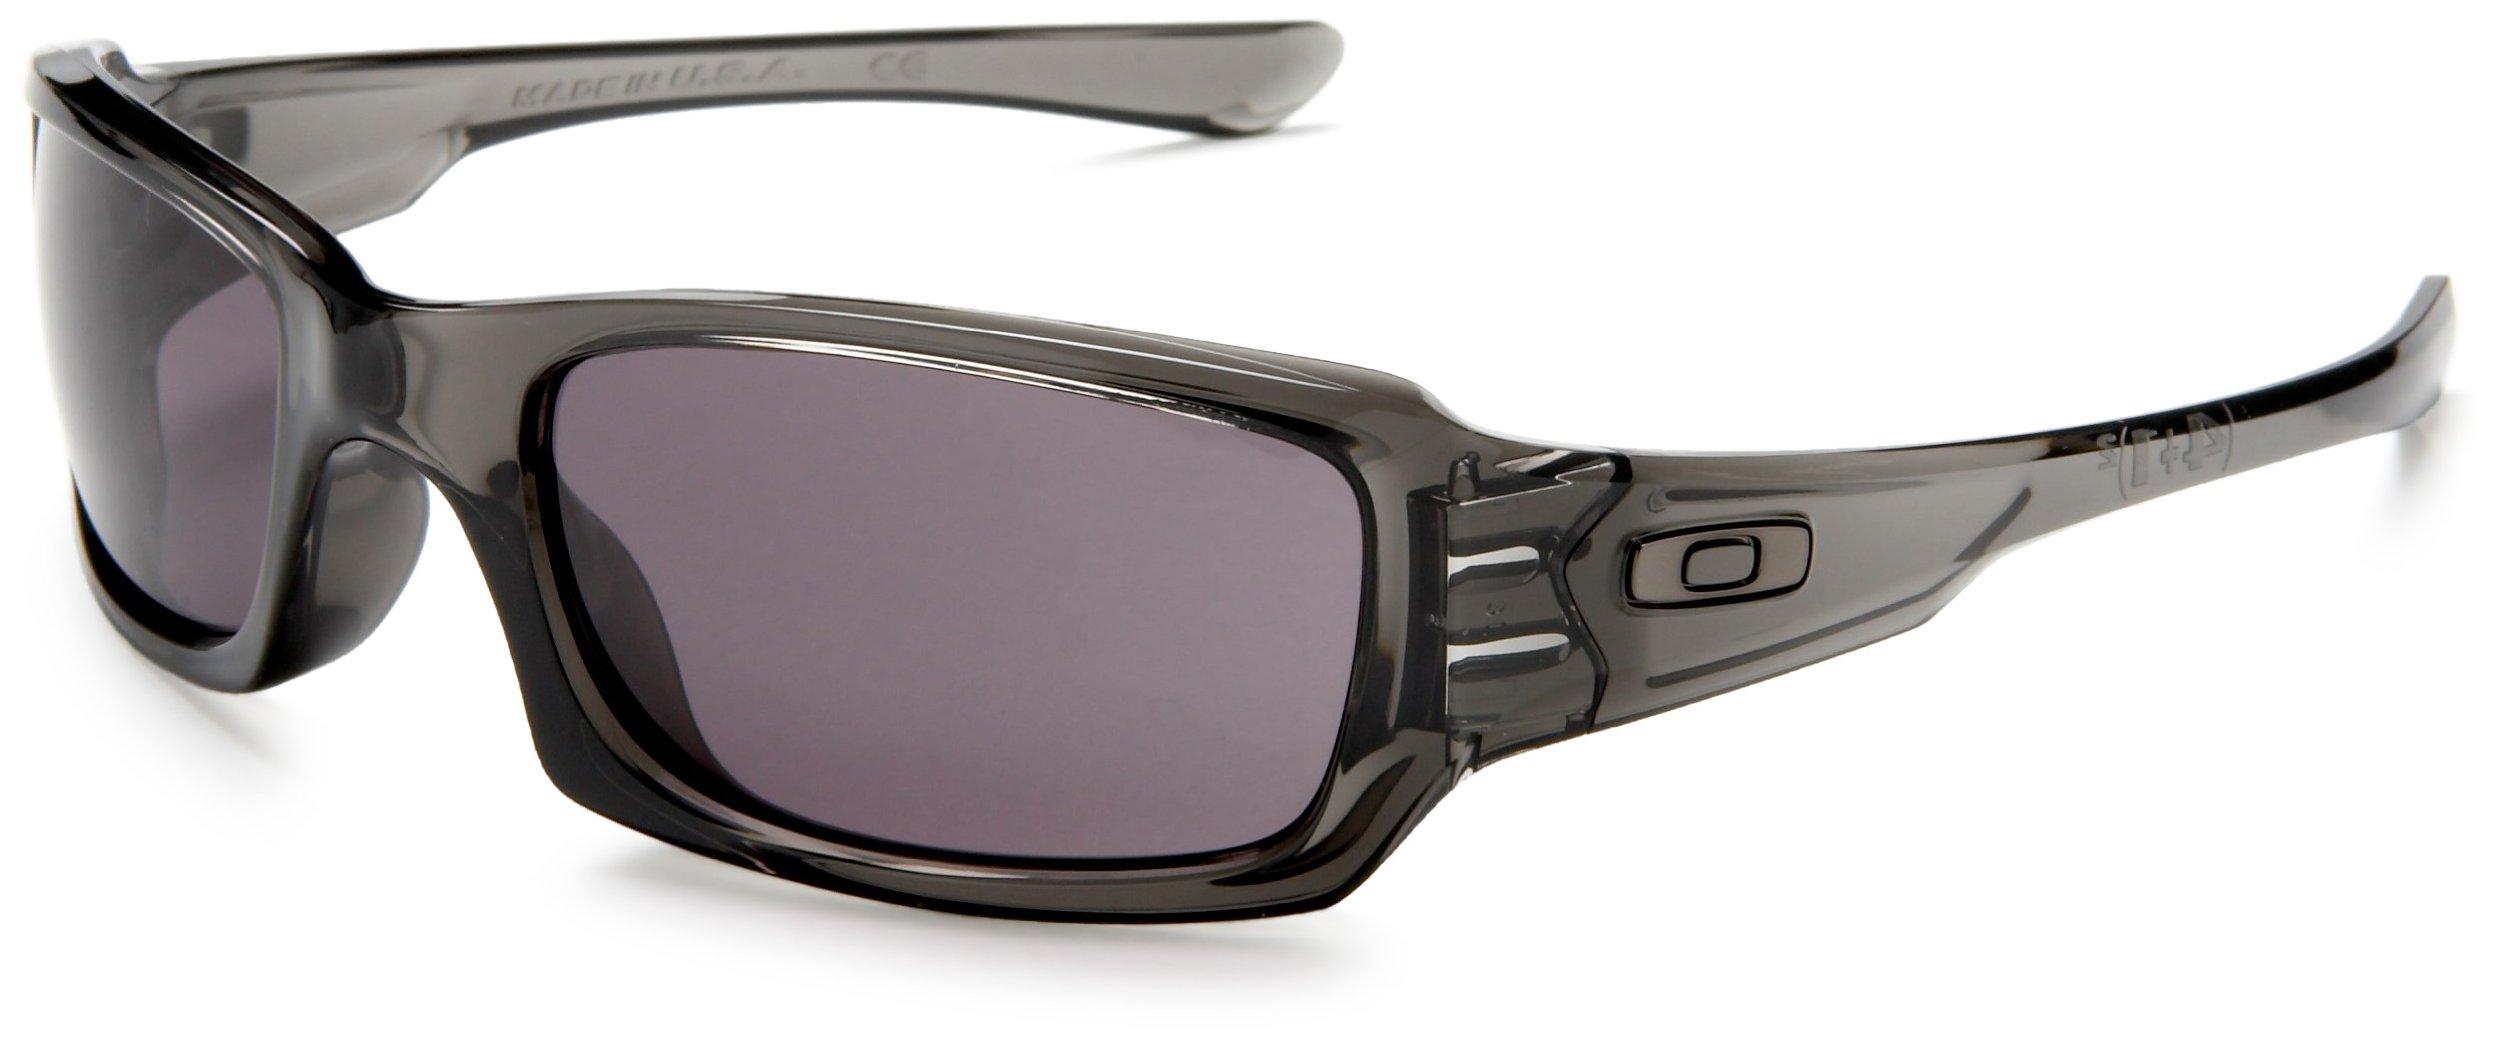 Oakley Men's Fives Squared Sunglasses,Grey Smoke Frame/Warm Grey Lens,one size by Oakley